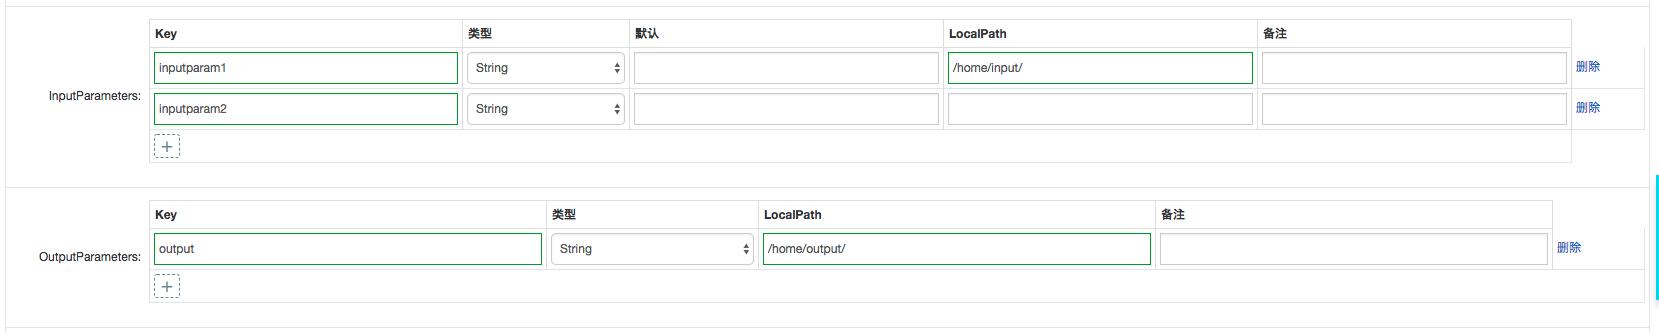 create_app_input_output1